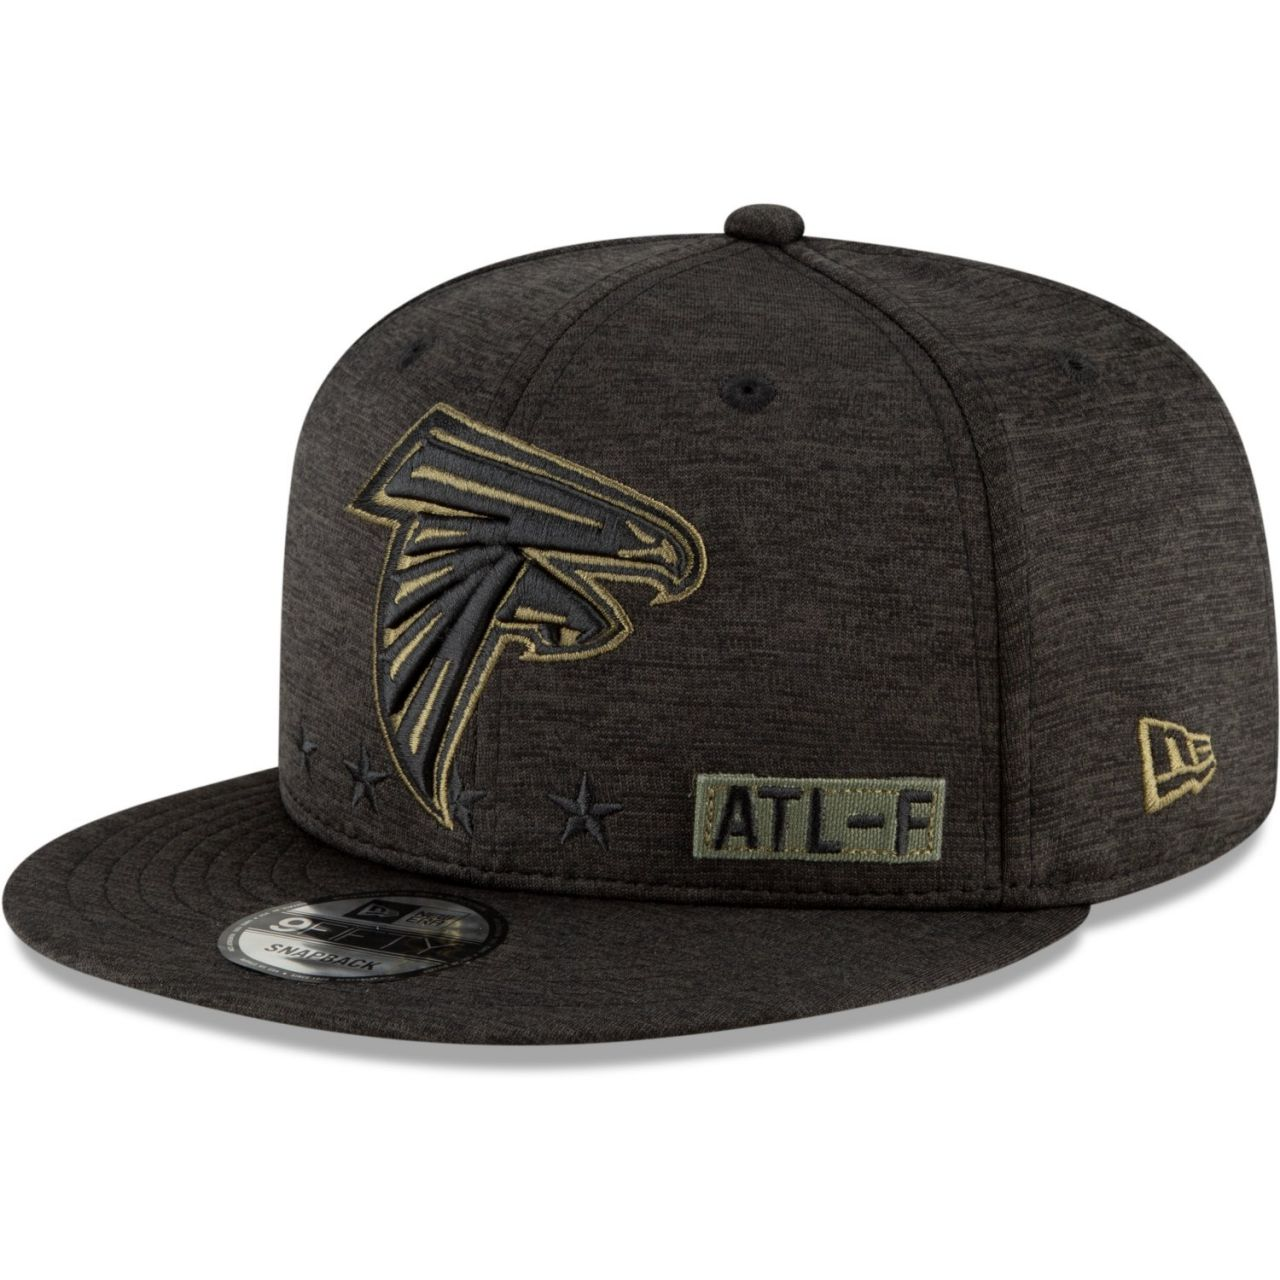 amfoo - New Era 9FIFTY Cap Salute to Service Atlanta Falcons